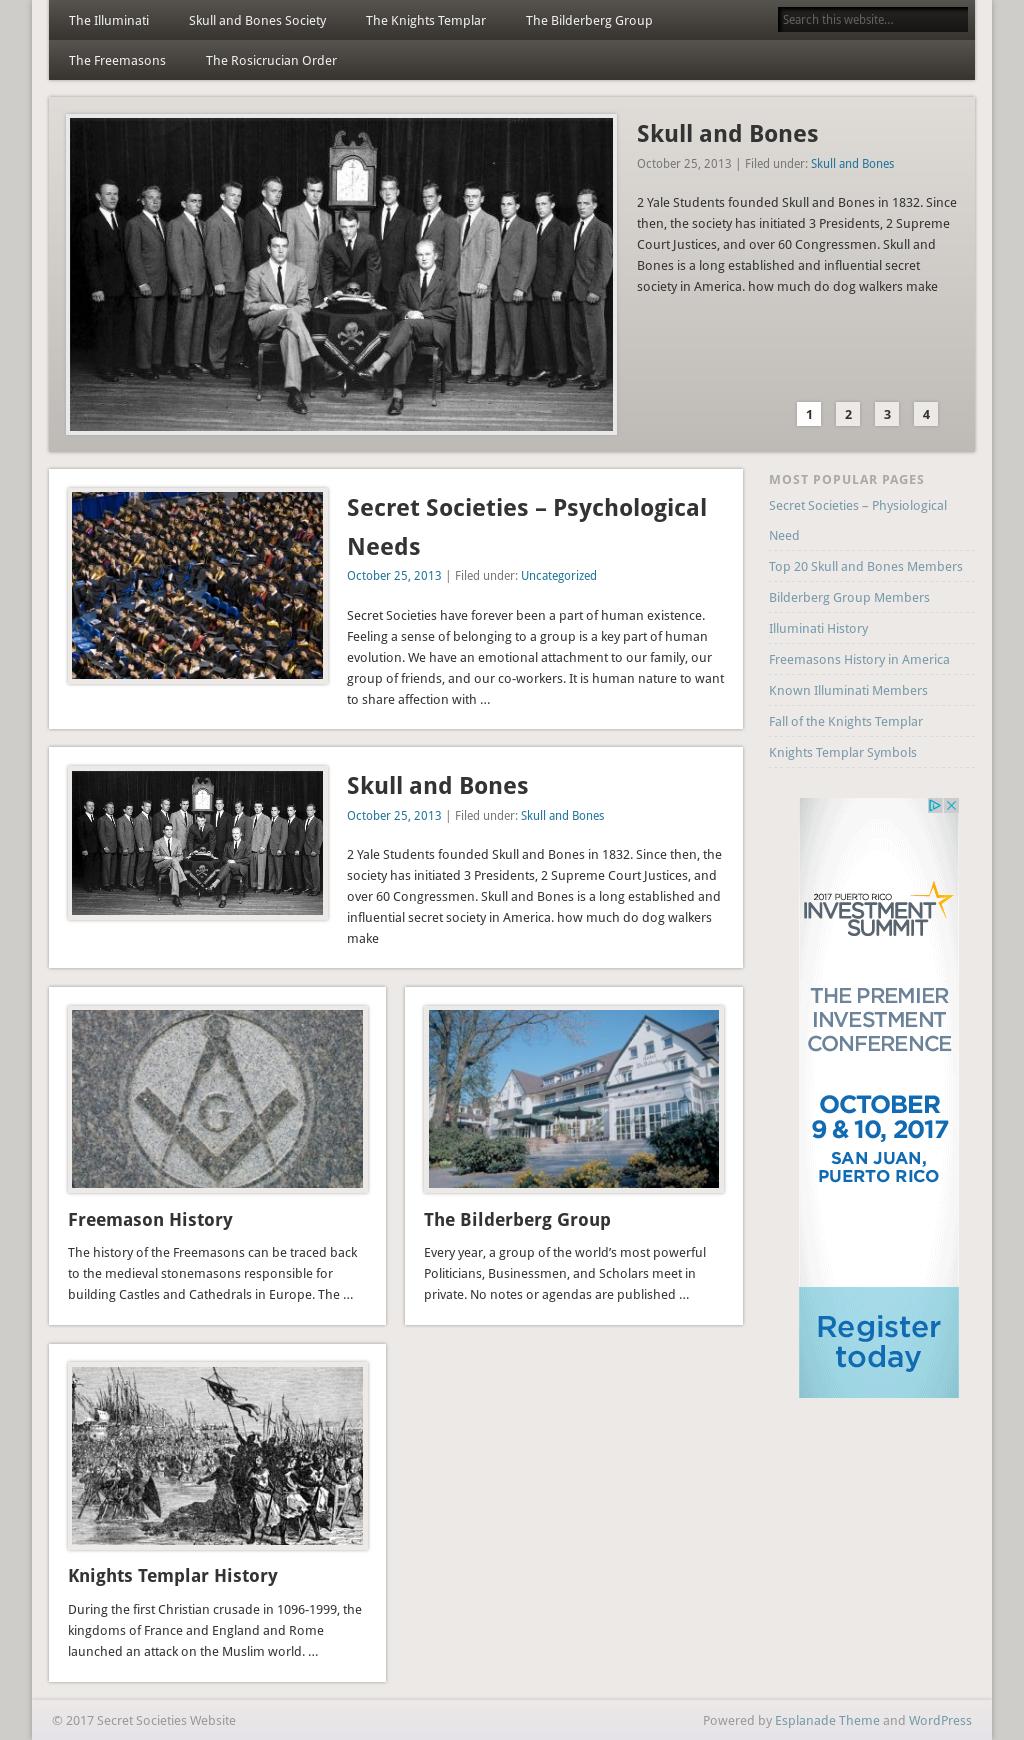 Secret Societies Website Competitors, Revenue and Employees